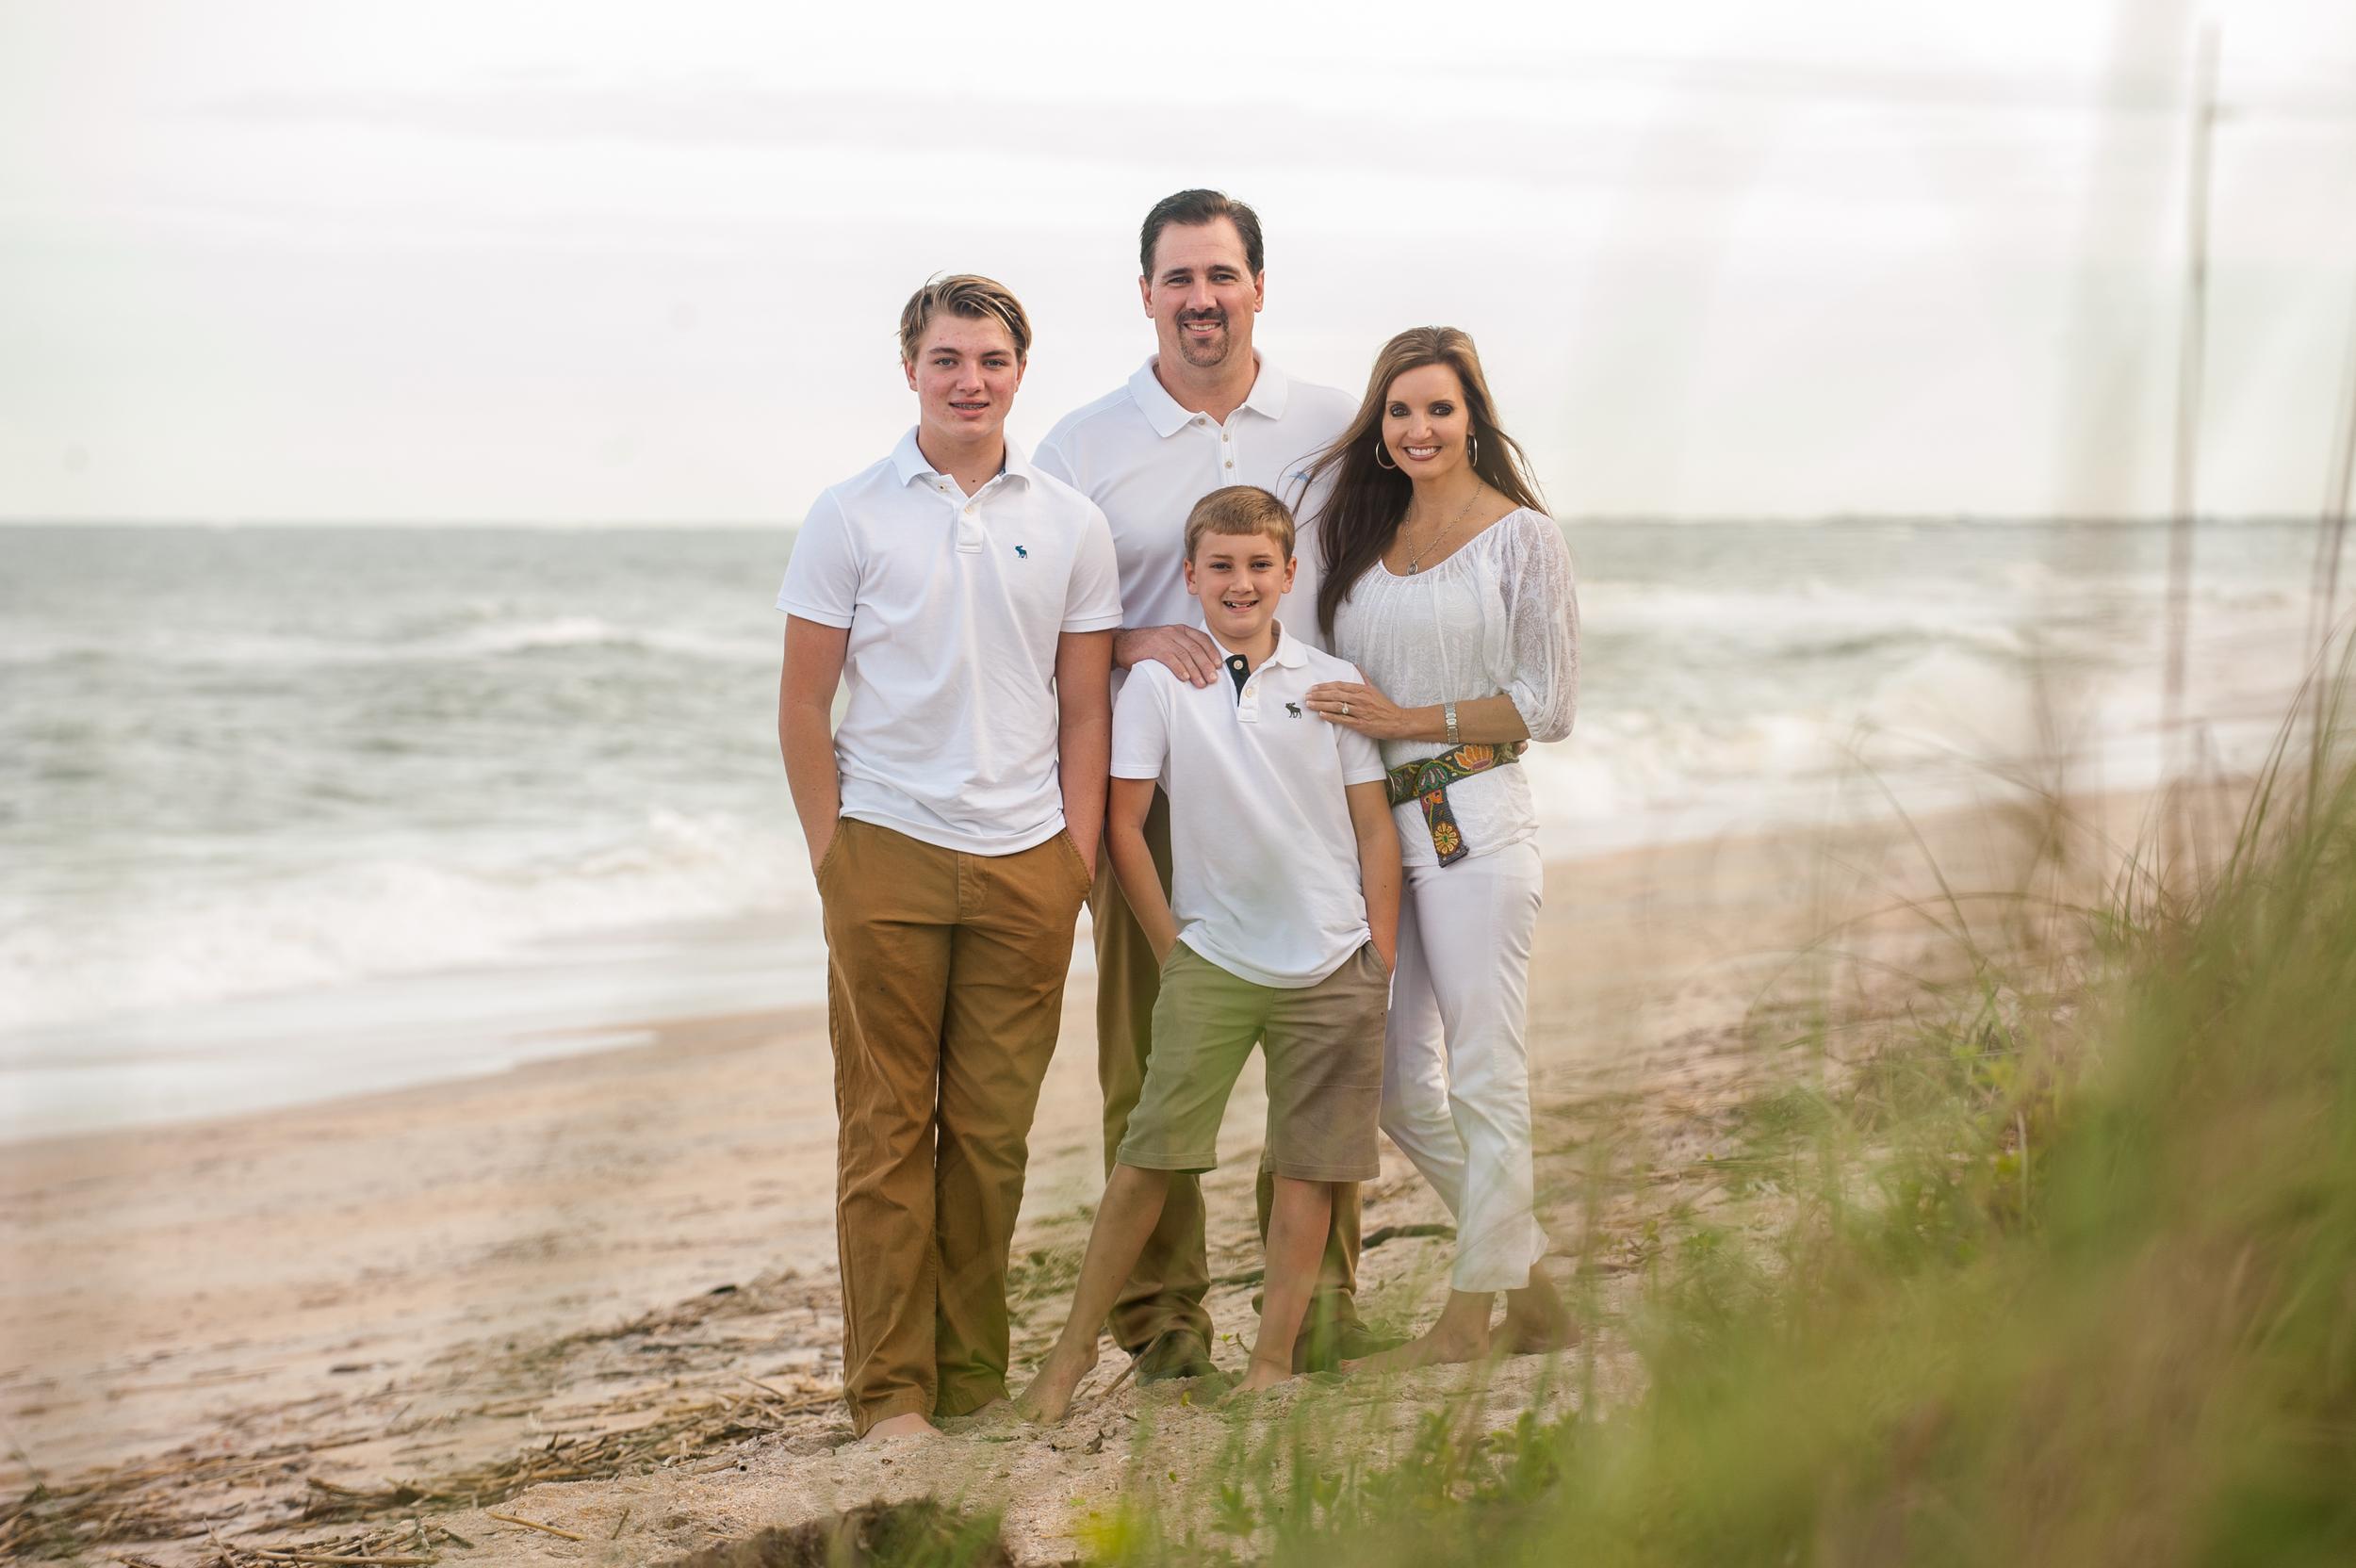 st.augustine_family_portrait_photographer